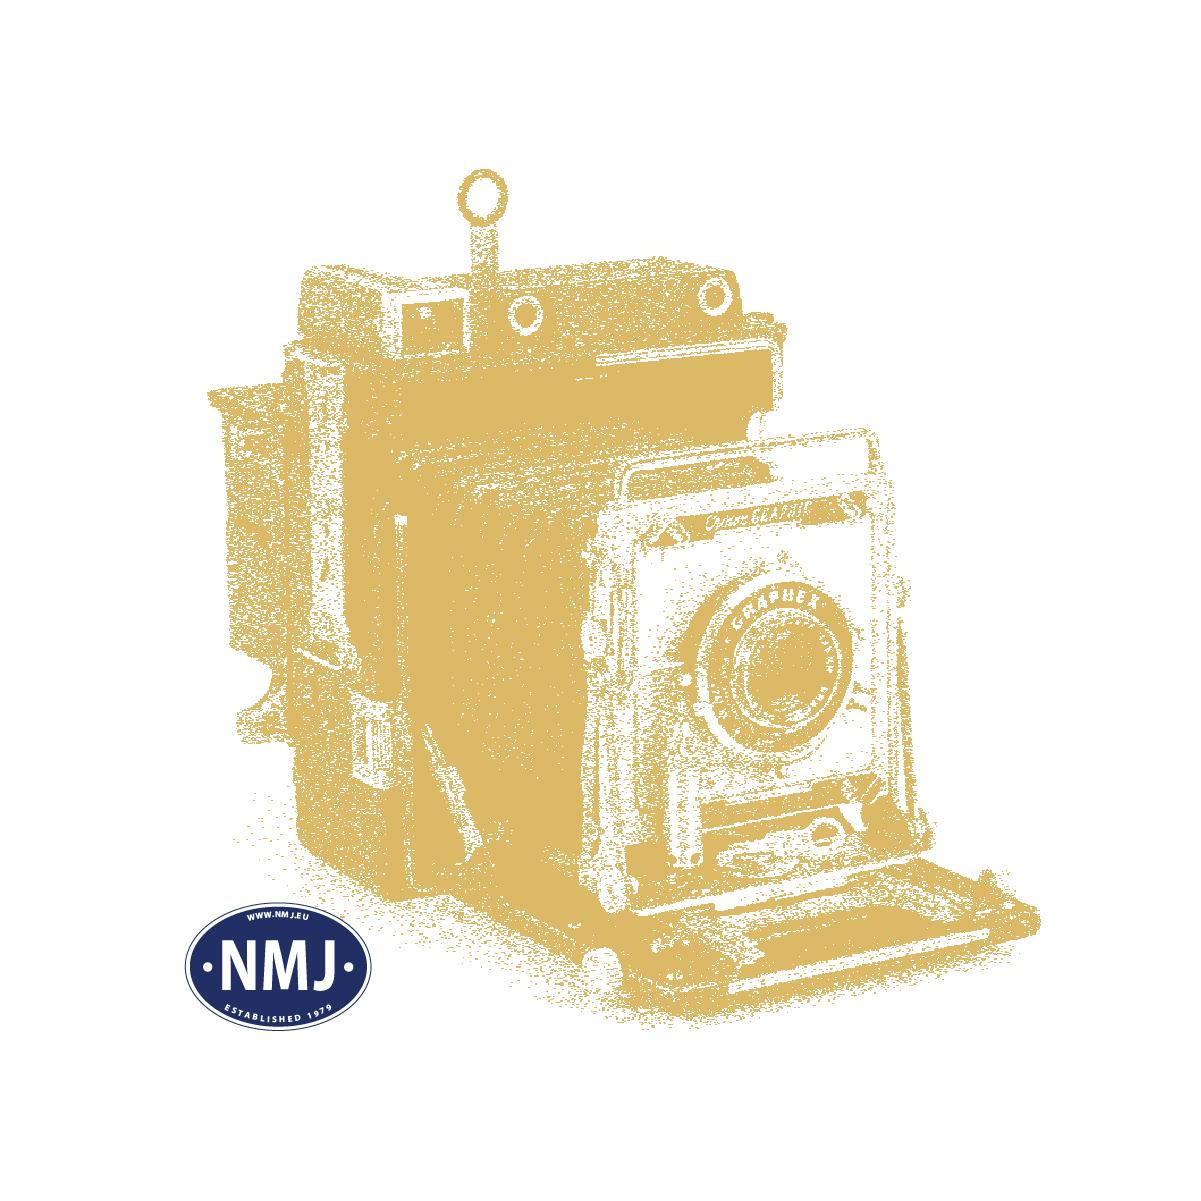 NMJT83.411 - NMJ Topline JBV SKD224.220, Rød/gul, DCC Digital